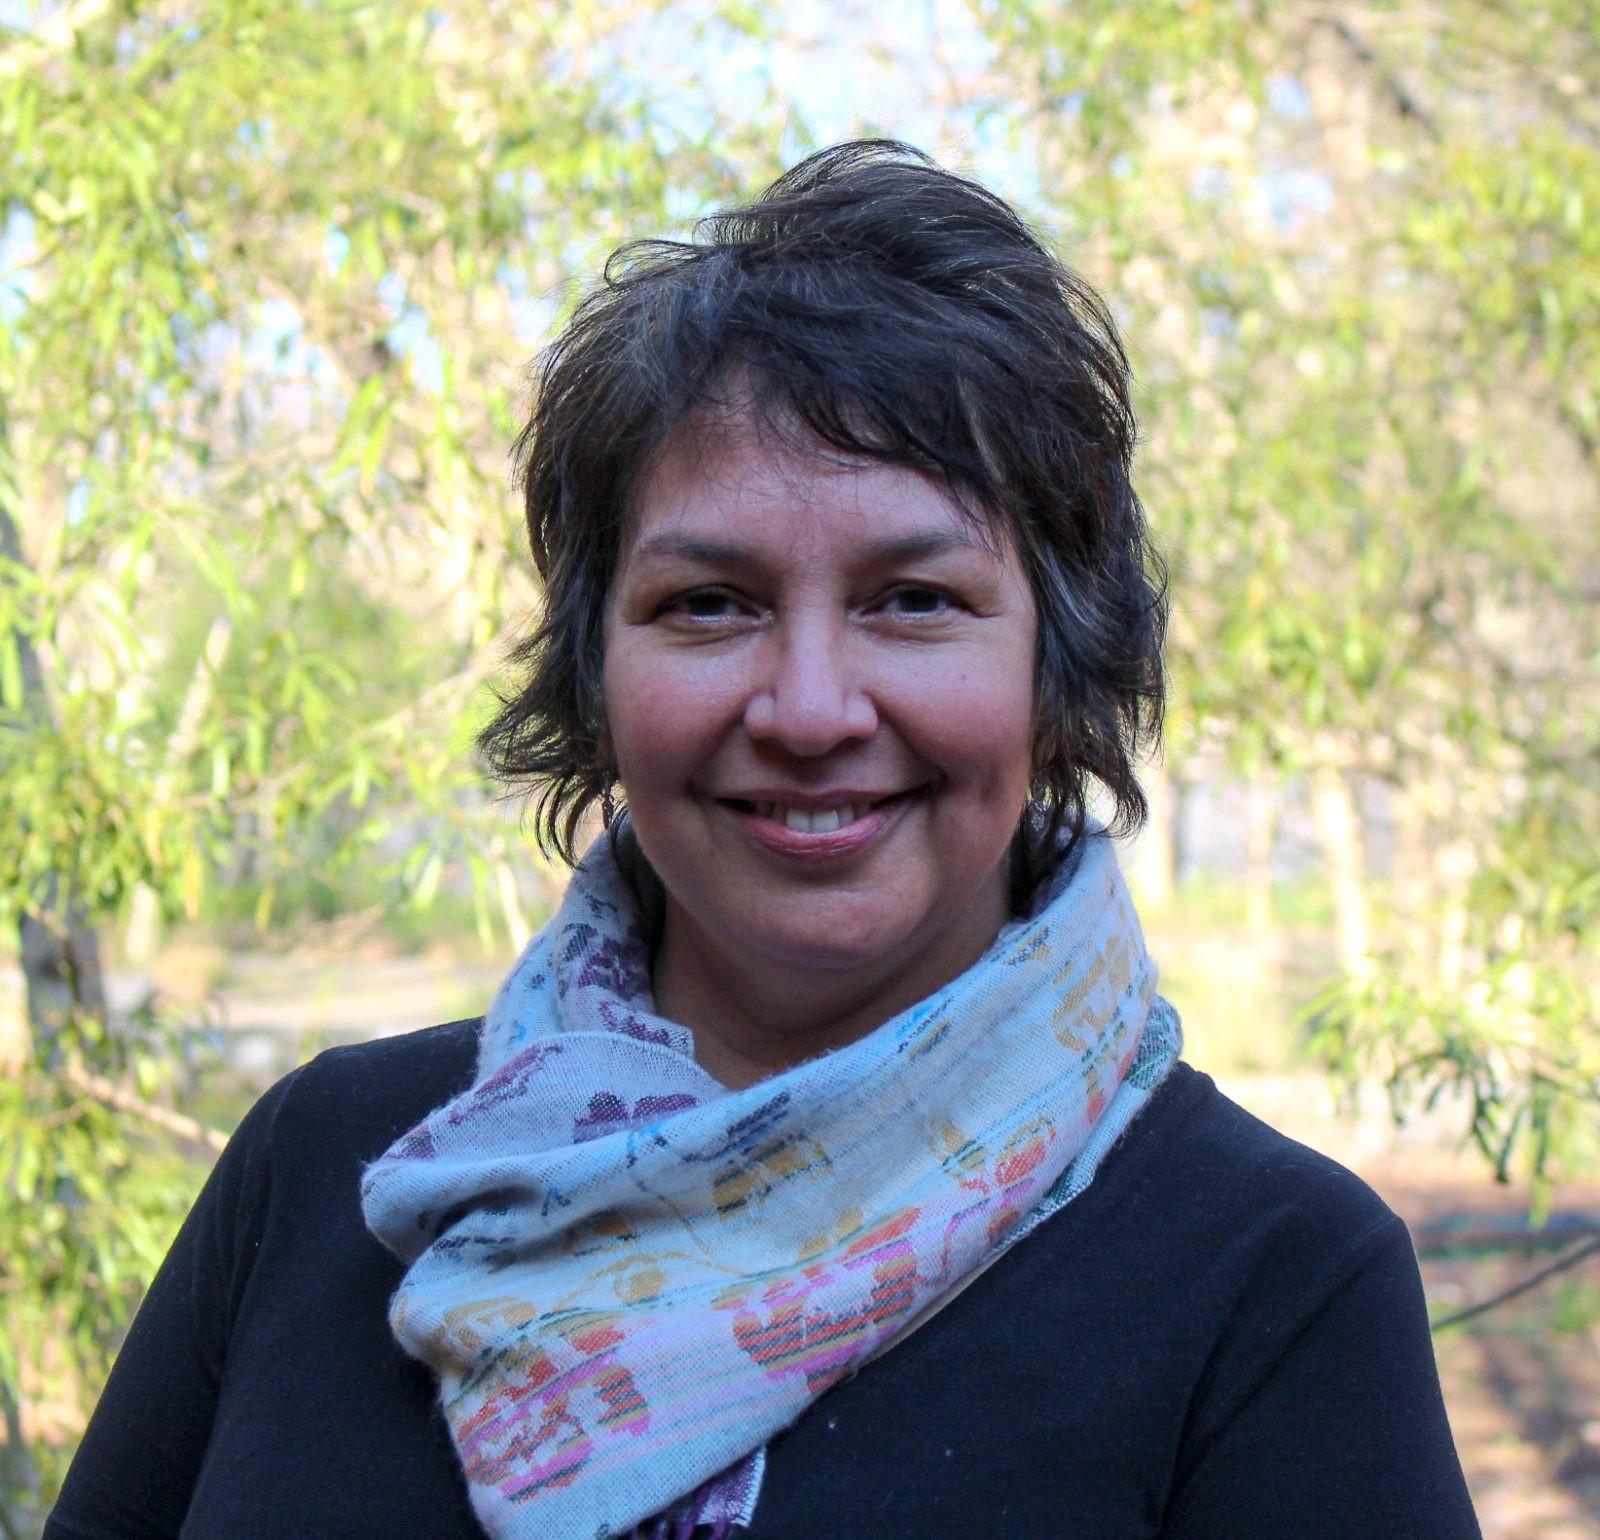 Julie Escobedo Gunby